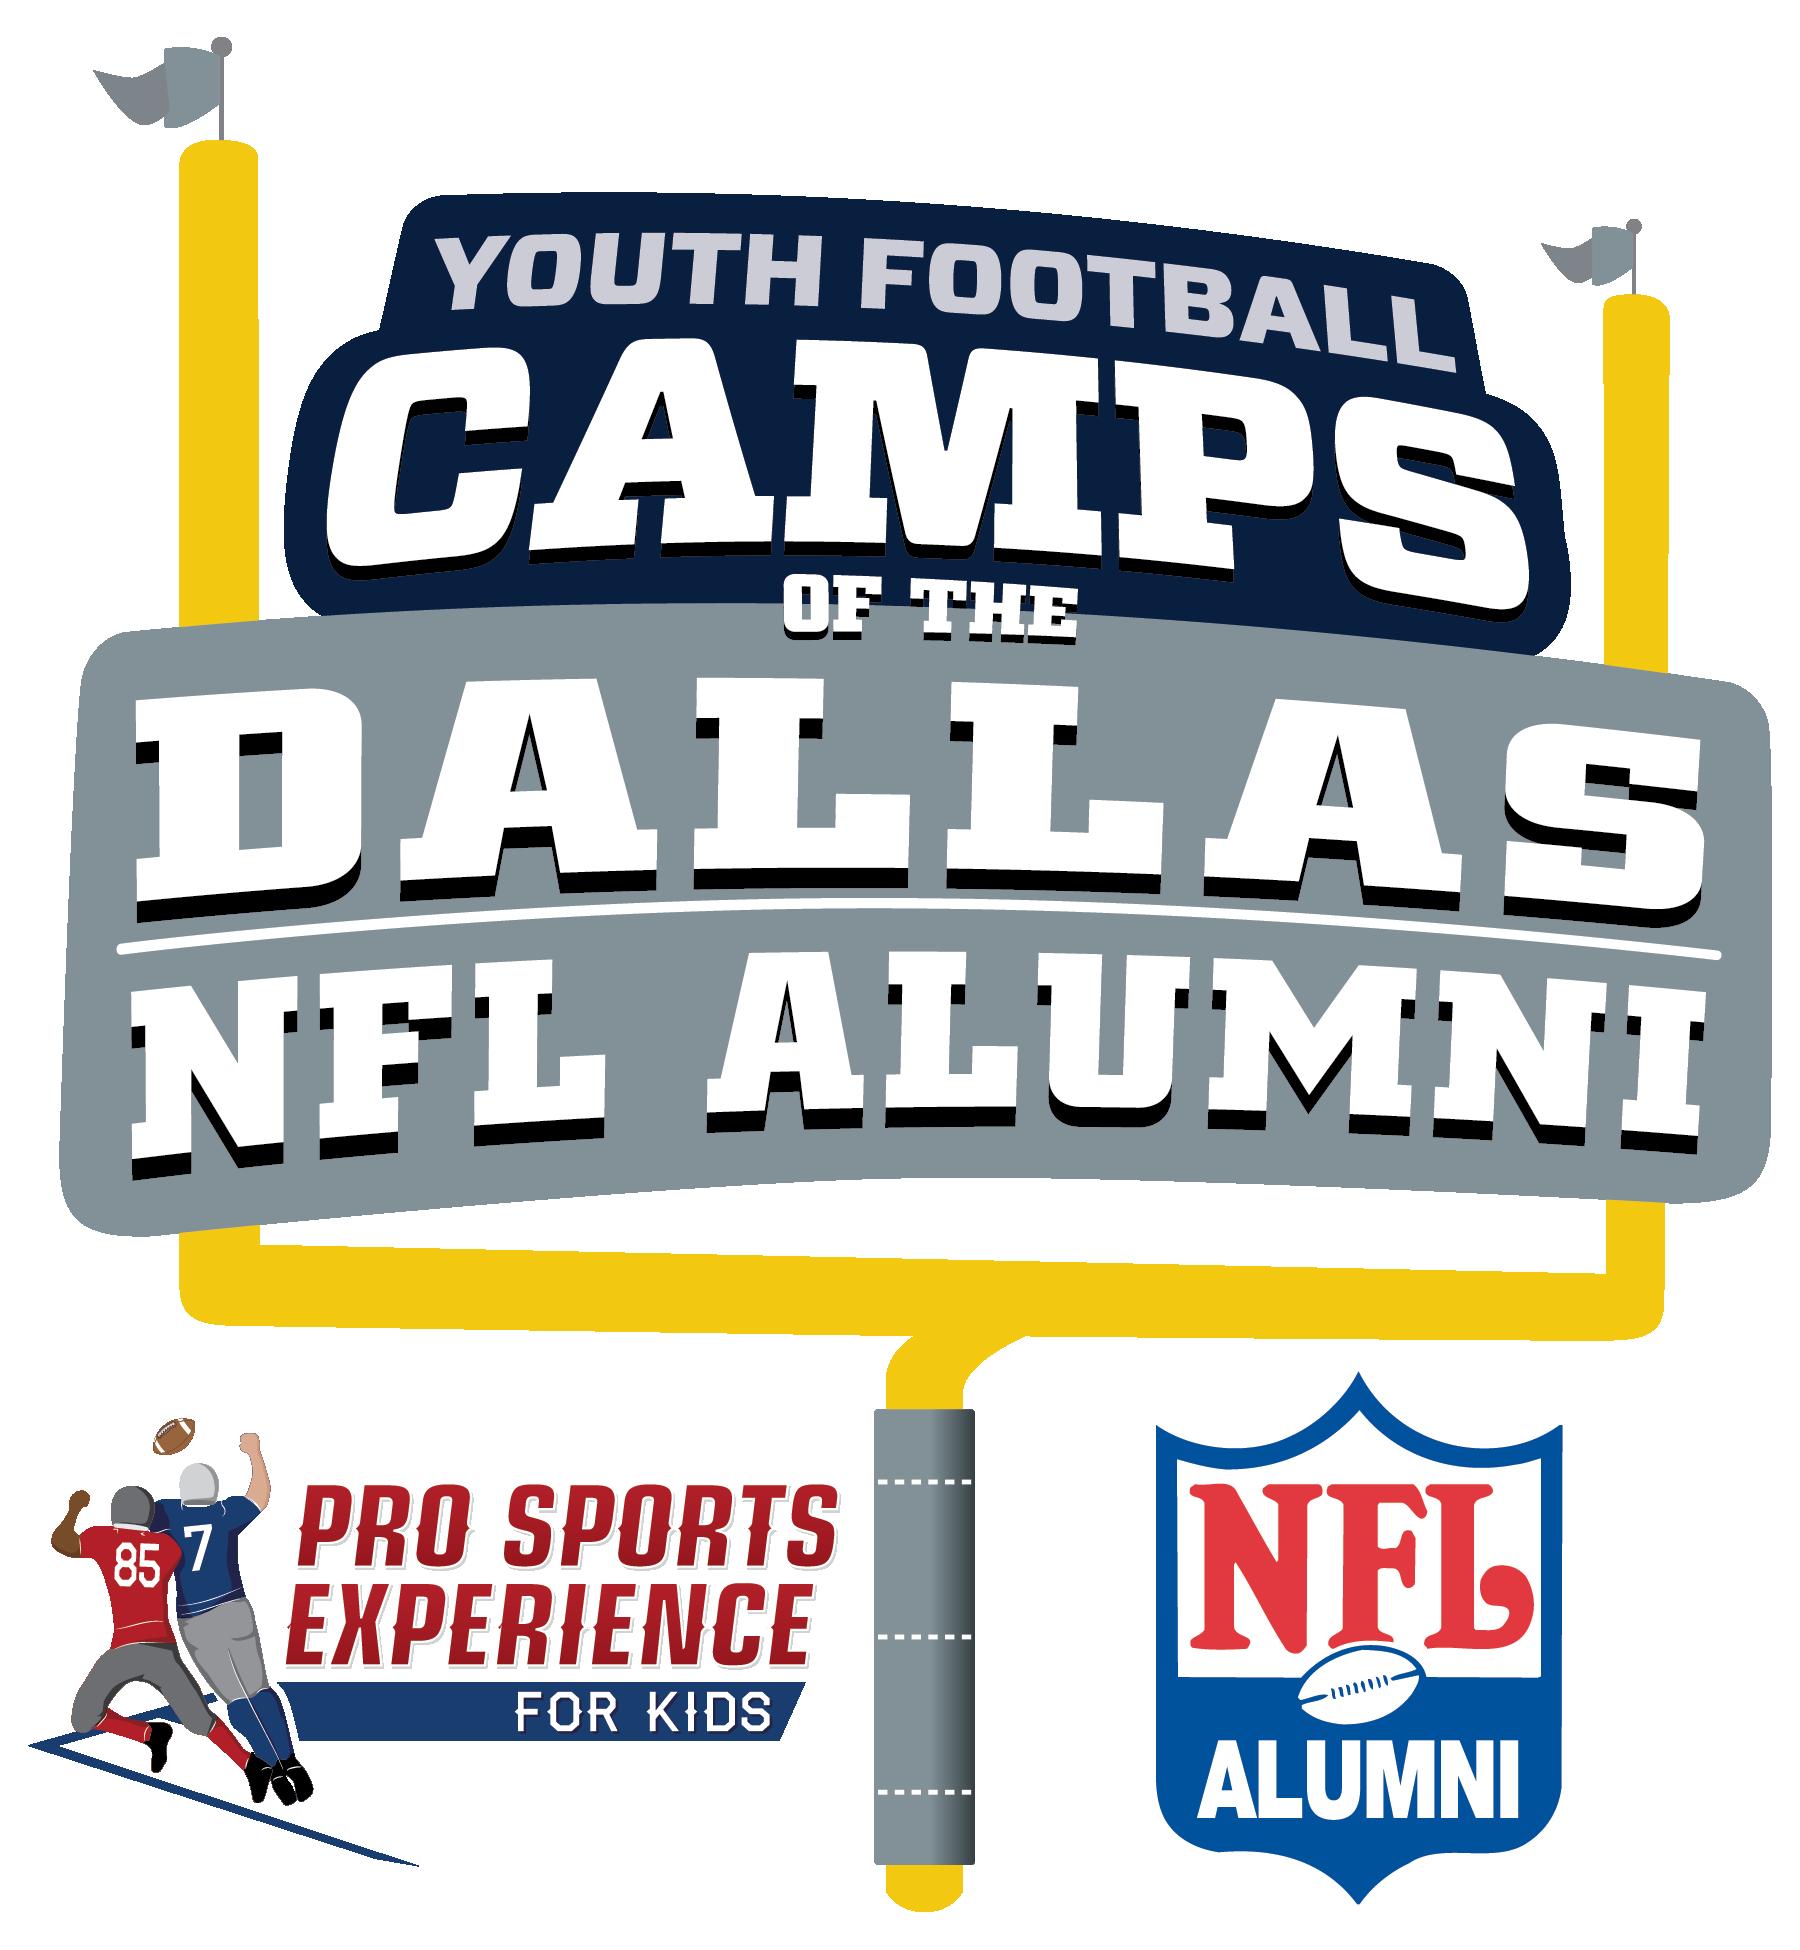 Dallas NFL Alumni Hero Youth Football Camps - Frisco